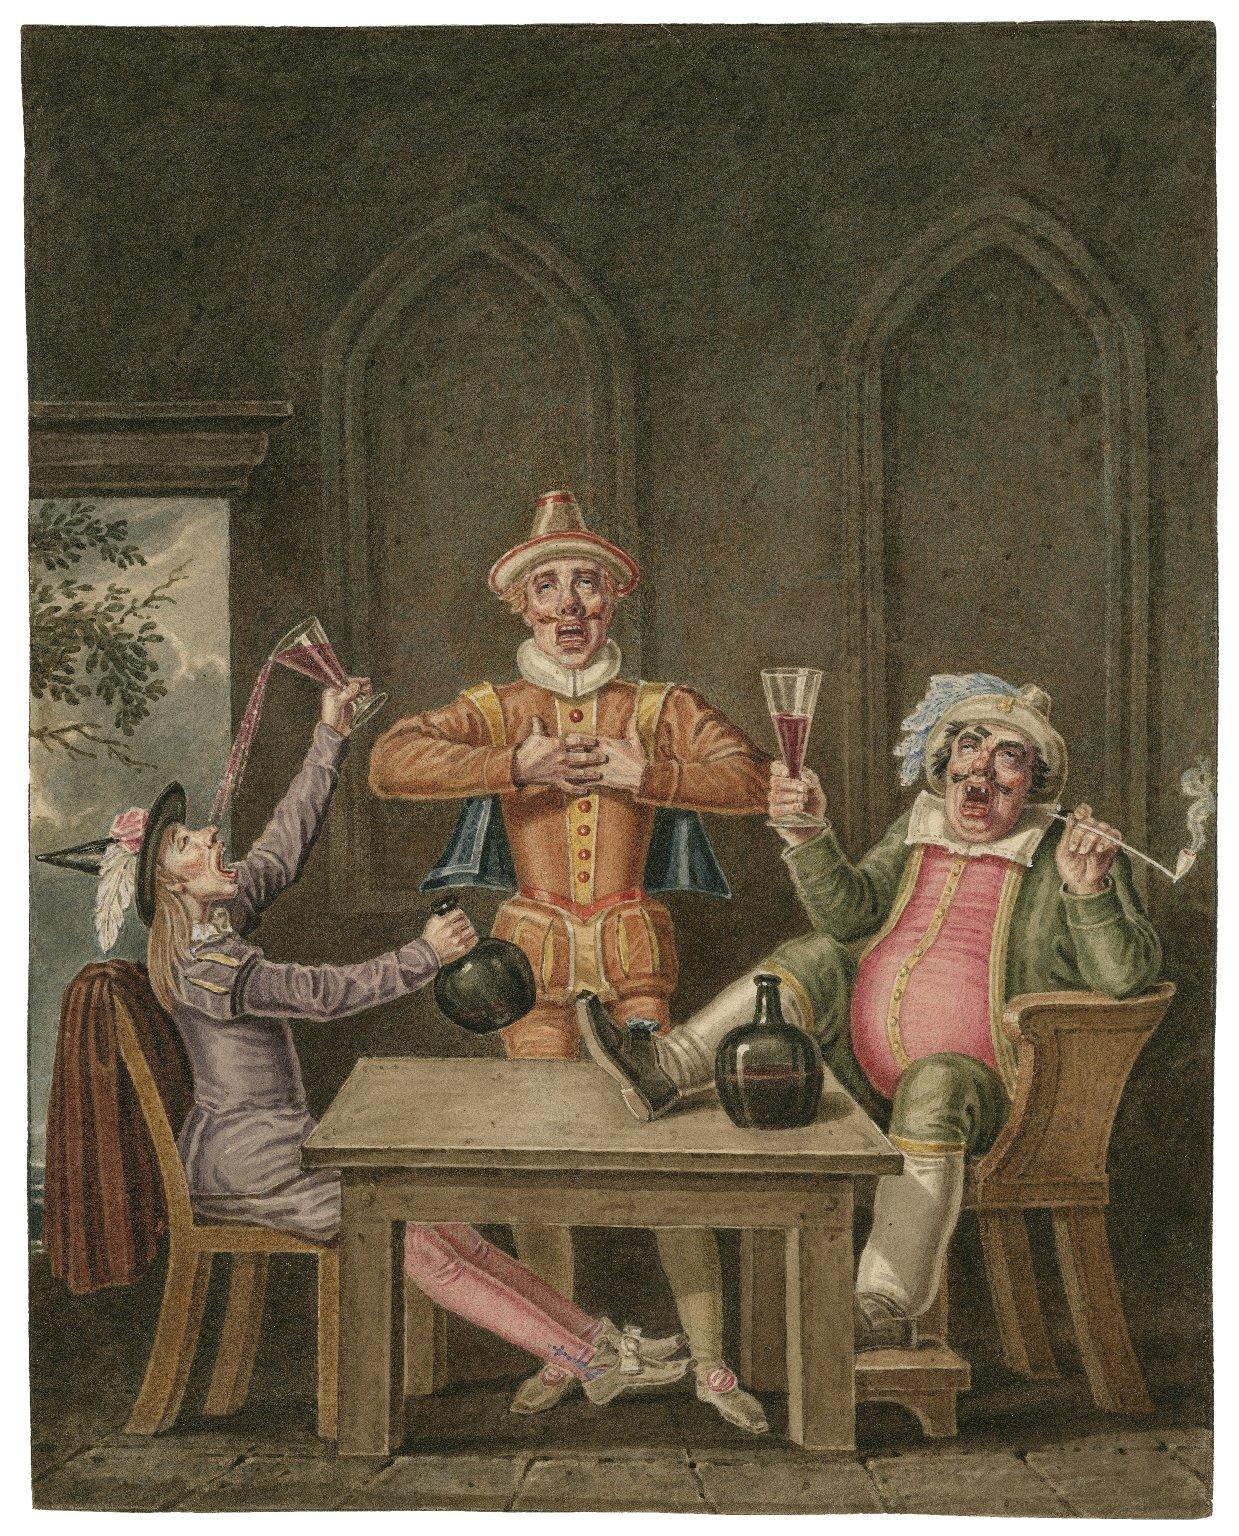 Twelfth night [I, 3] Sir Toby Belch, Sir Ague-cheek and Clown [graphic] / [J. Coghlan].